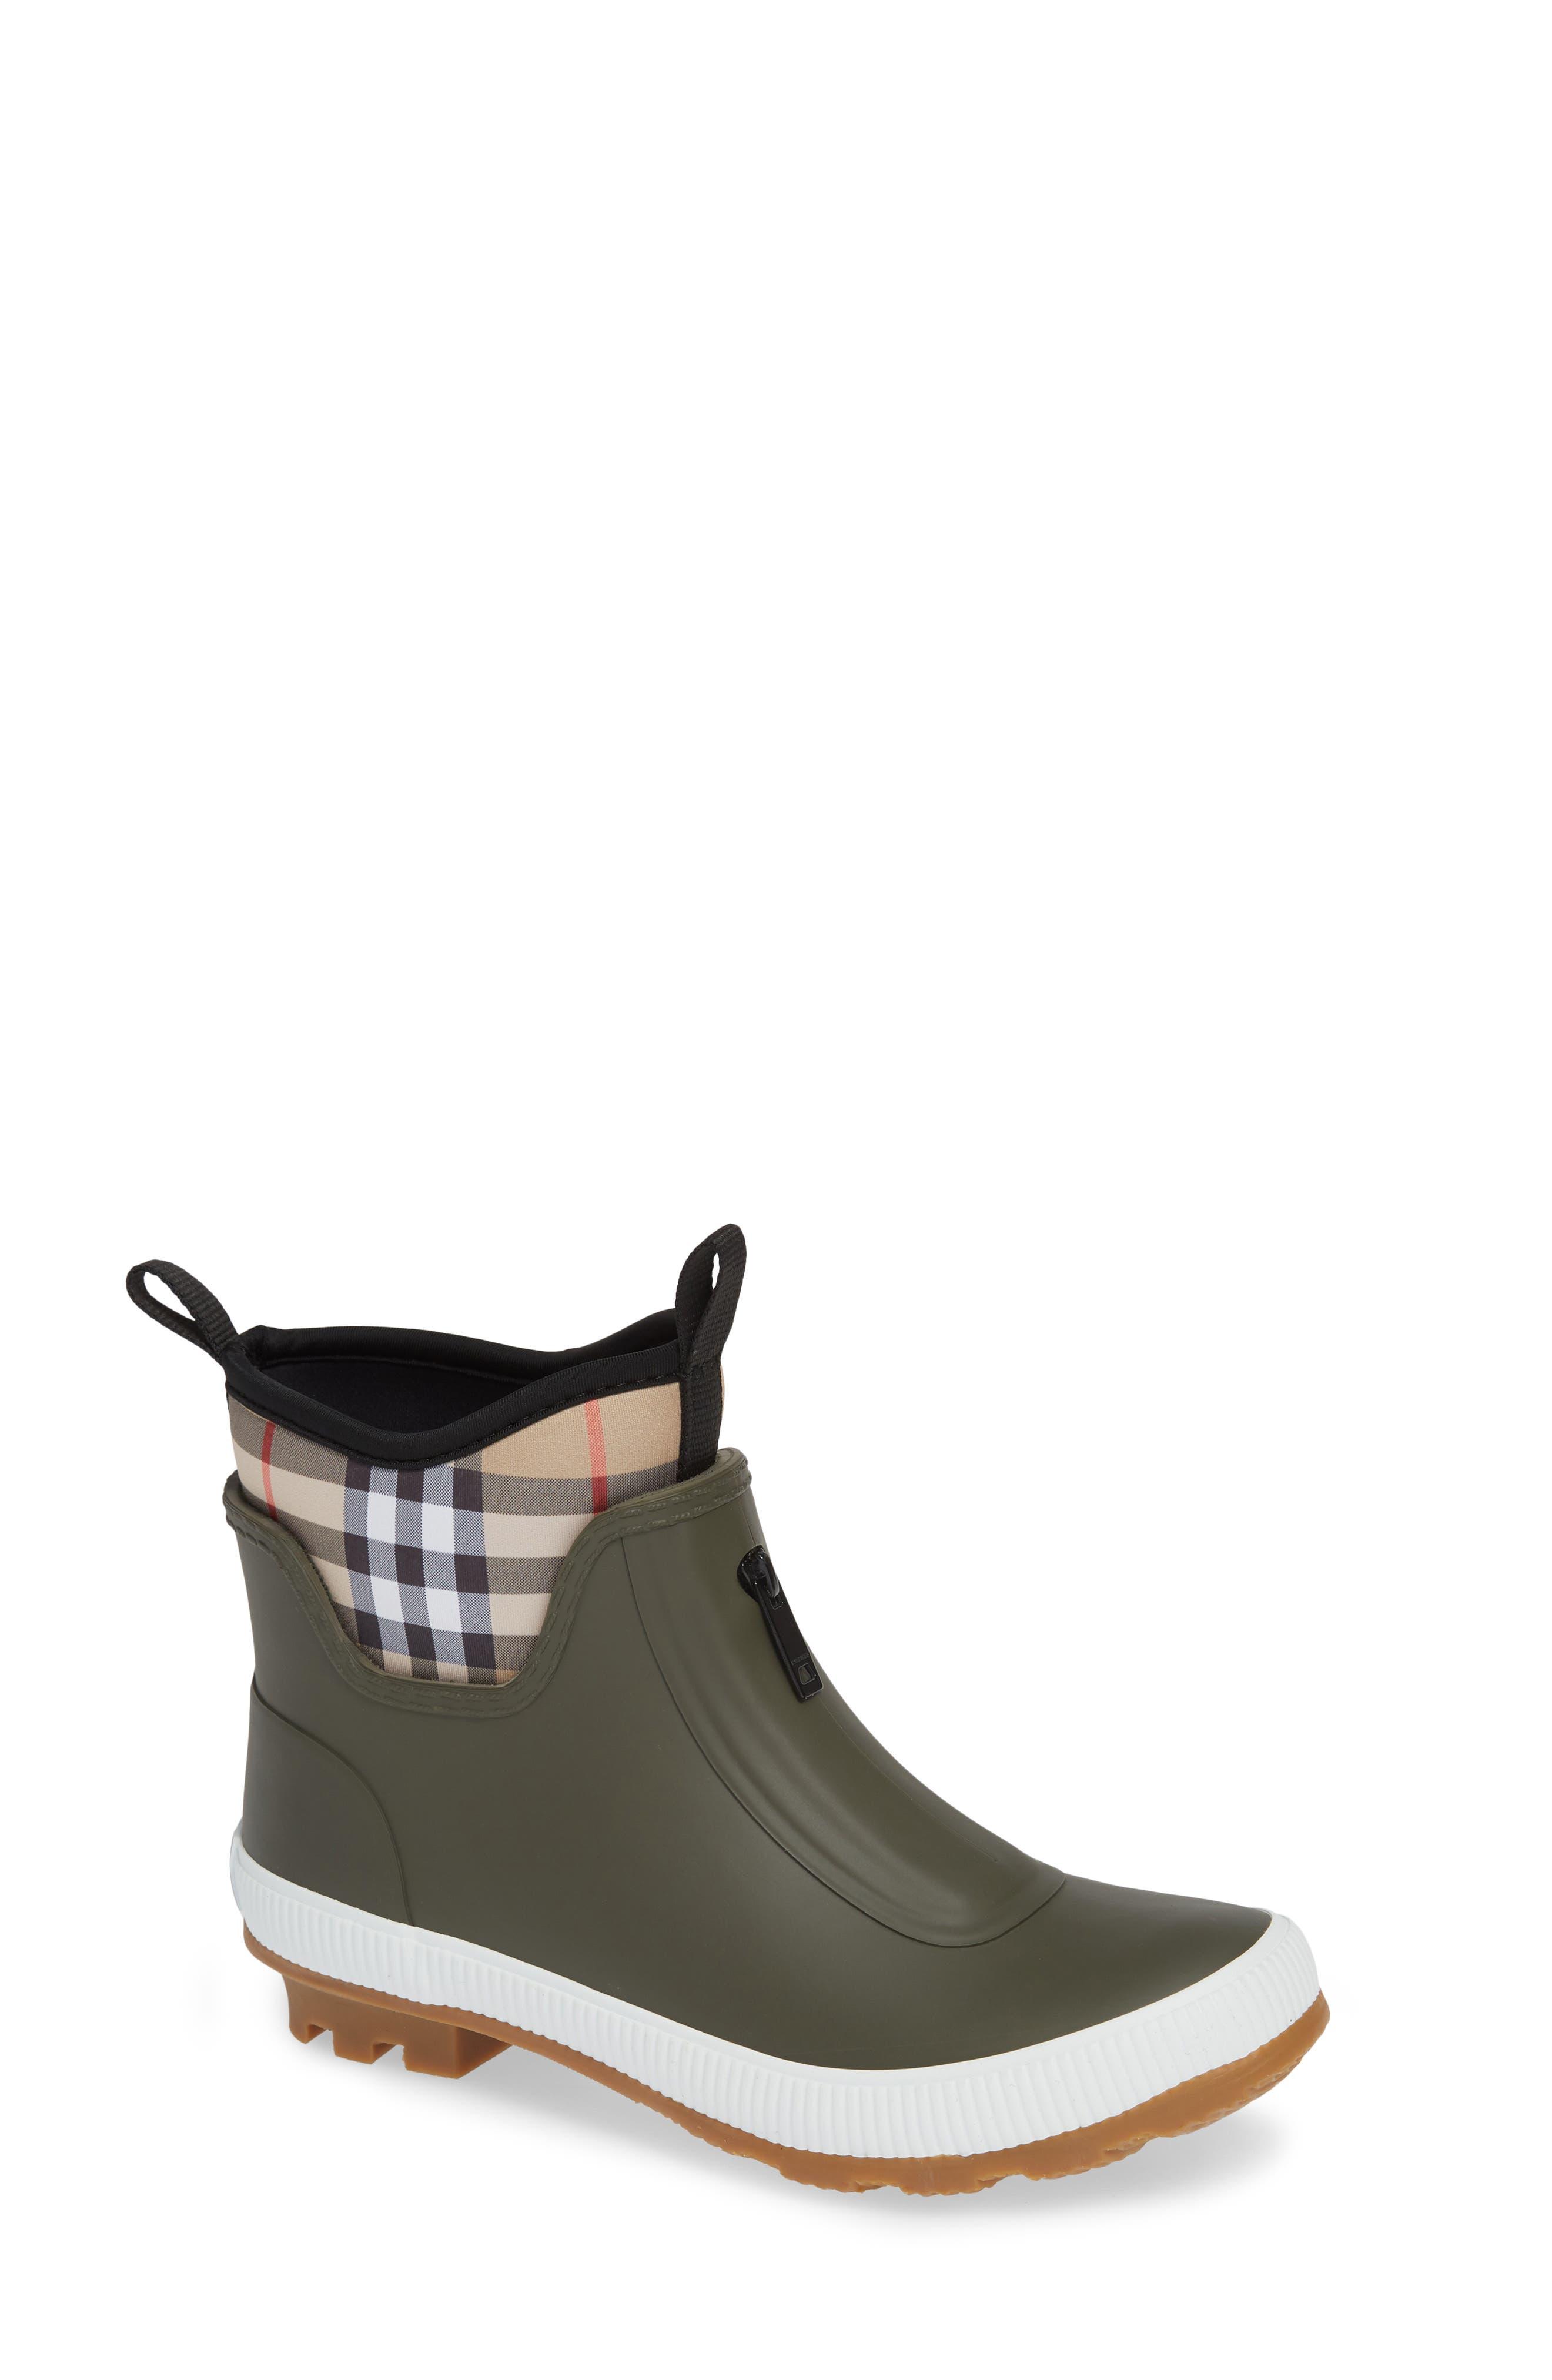 Toddler Burberry Flinton Rain Boot Size 13US  31EU  Blue